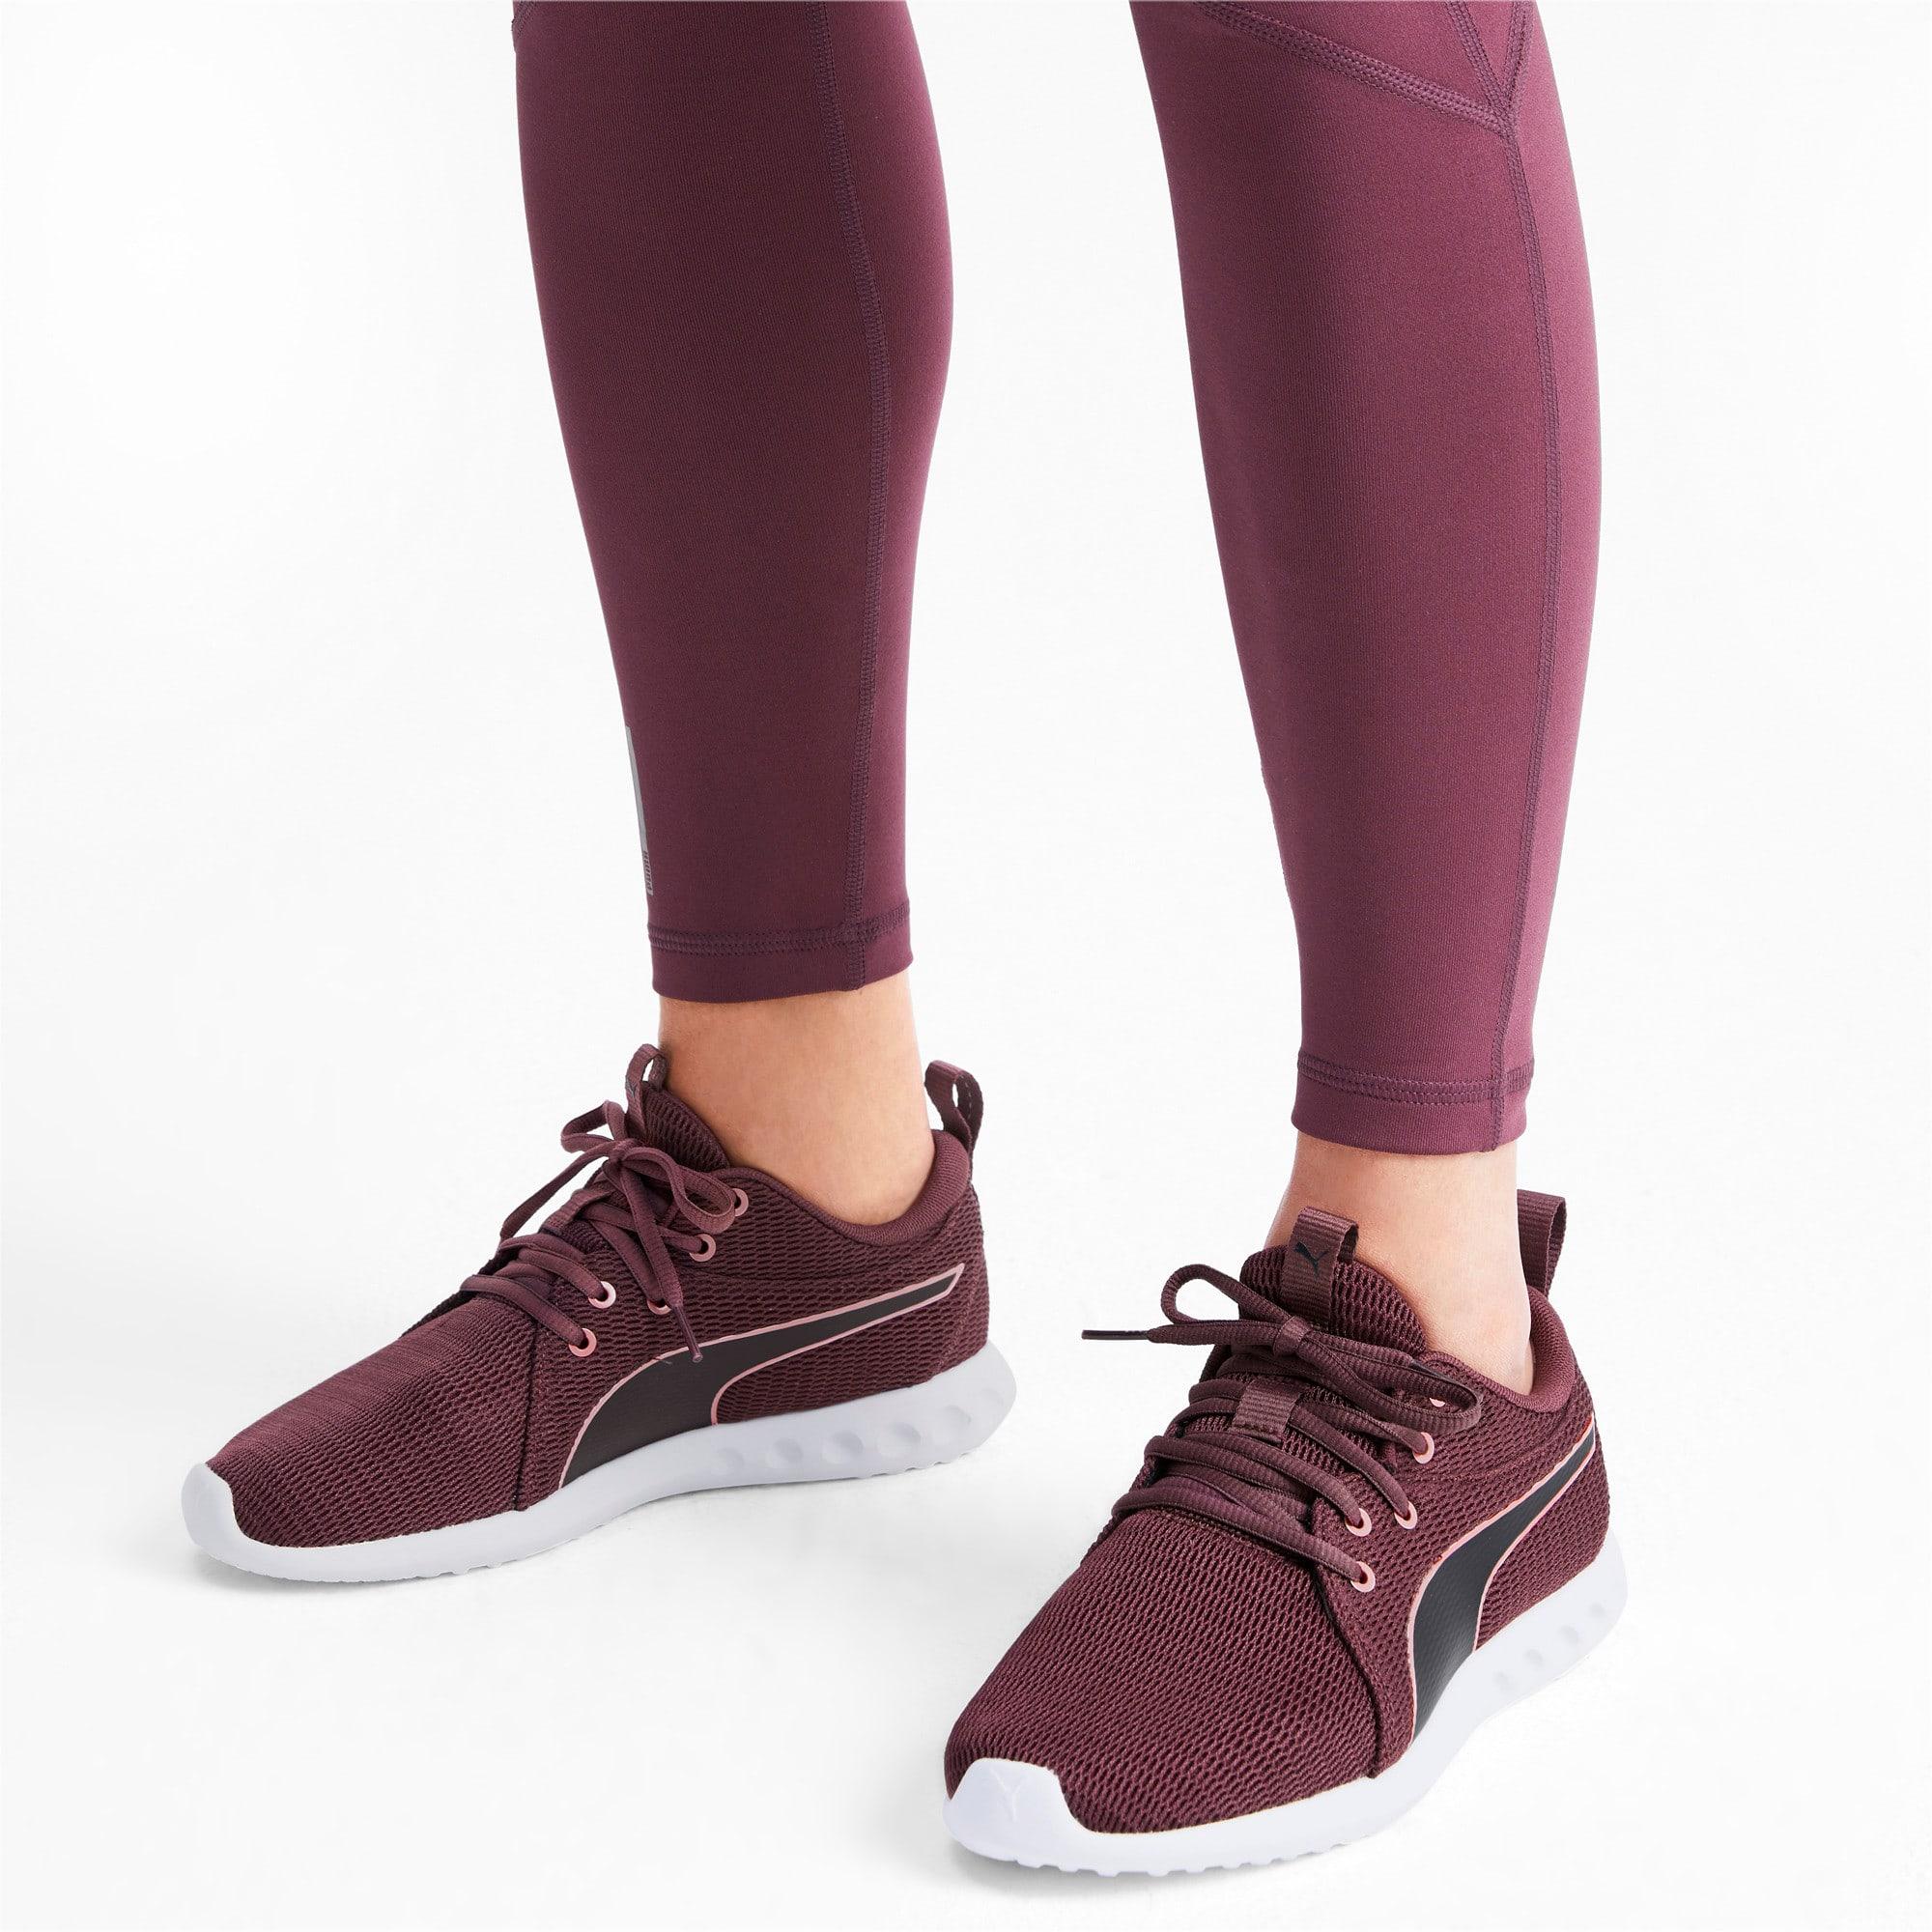 Thumbnail 3 of Carson 2 New Core Women's Training Shoes, Vineyard Wine-Black-Rose, medium